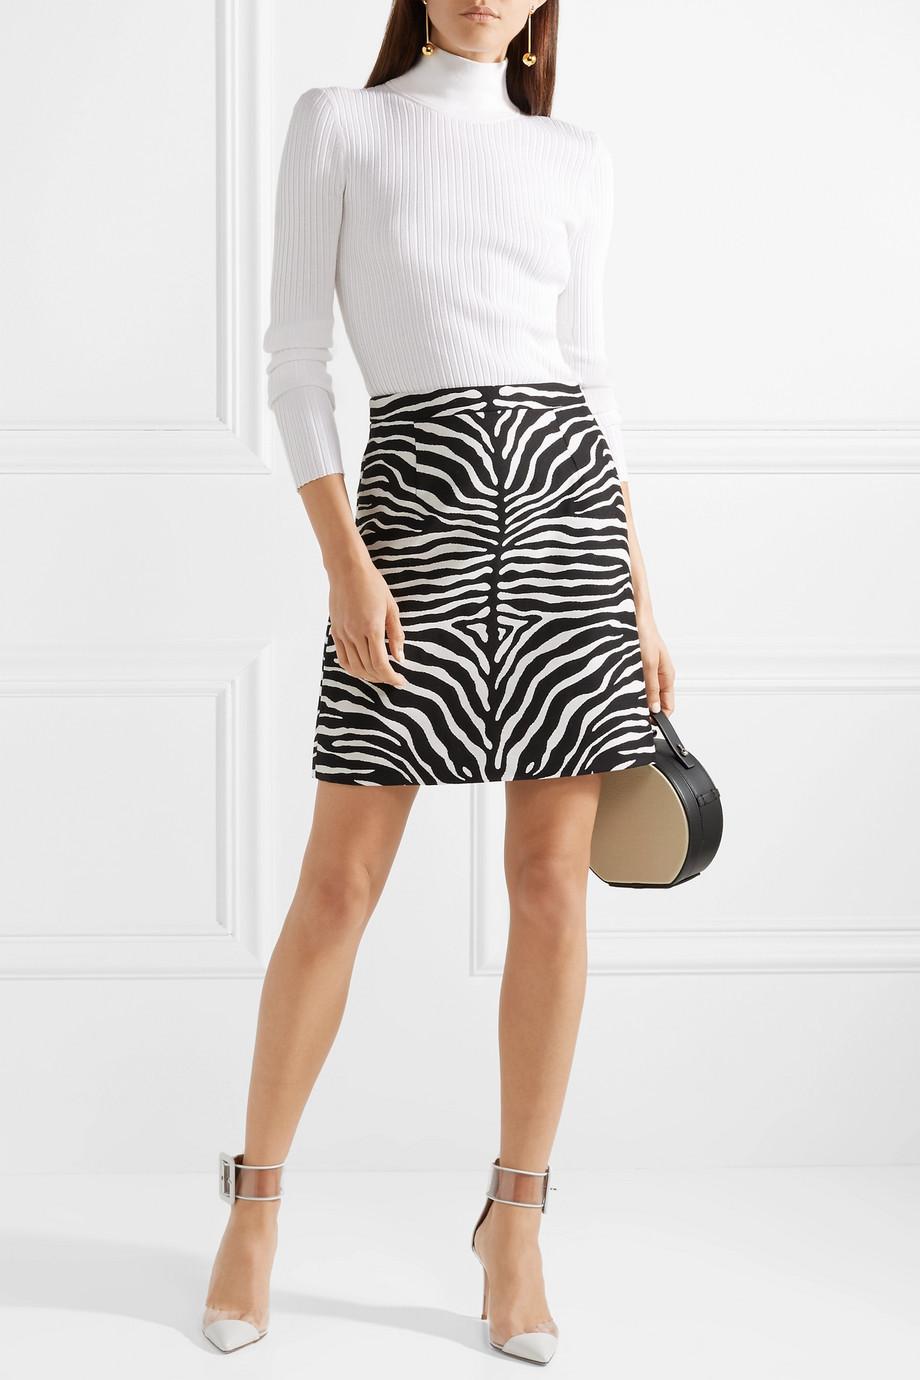 Michael Kors Collection Zebra Print Wool-jacquard mini skirt $550